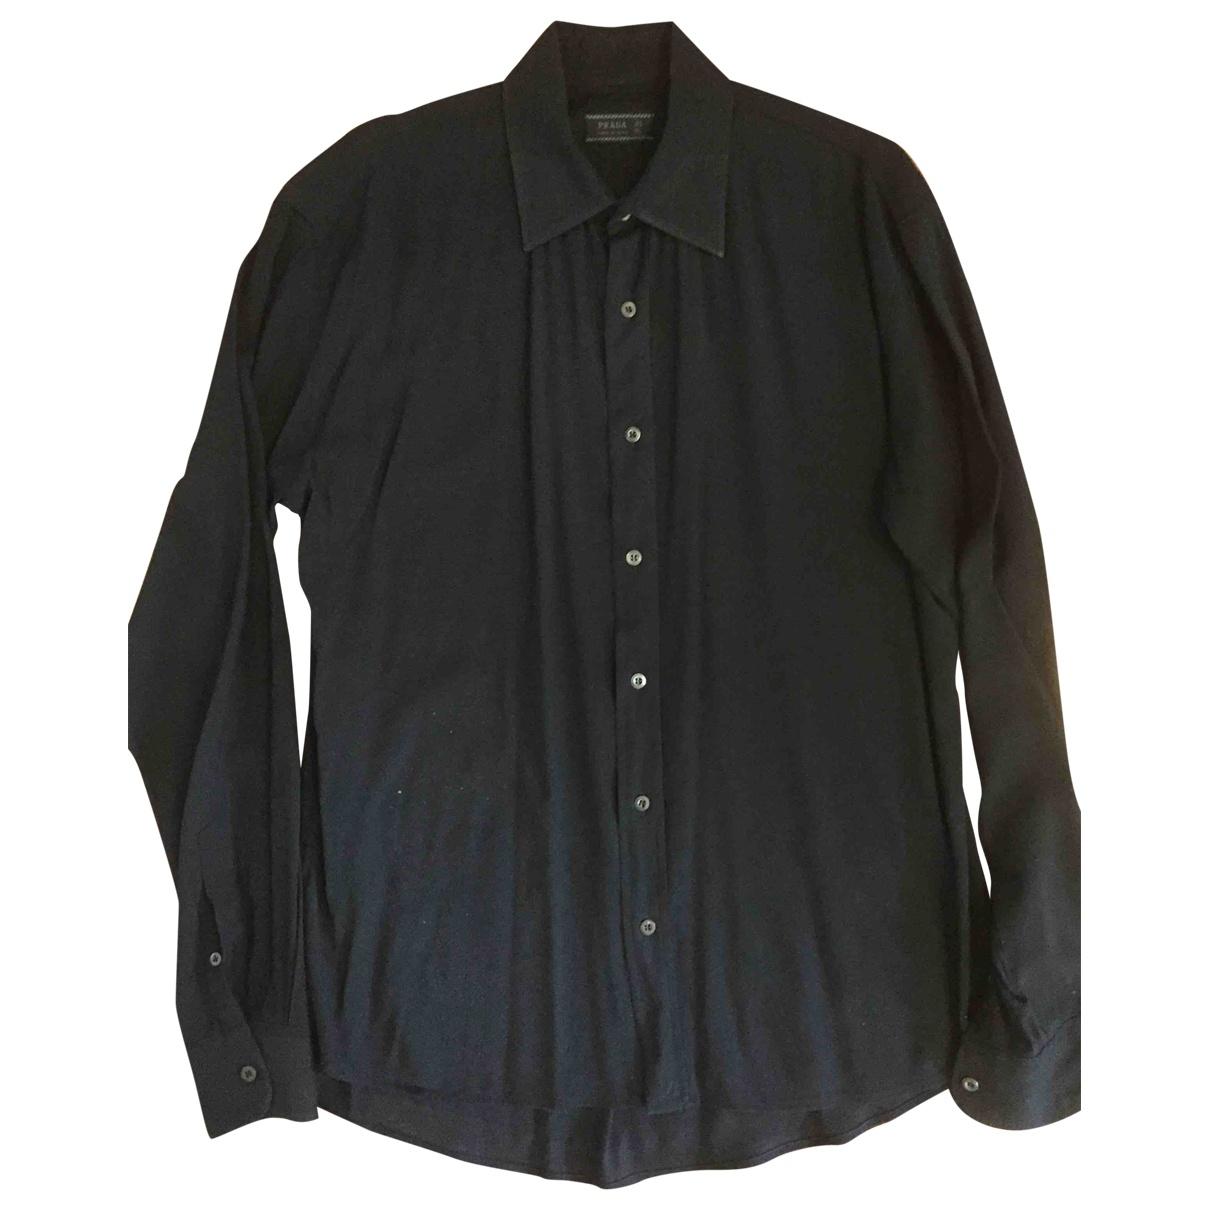 Prada \N Blue Cotton Shirts for Men 40 EU (tour de cou / collar)